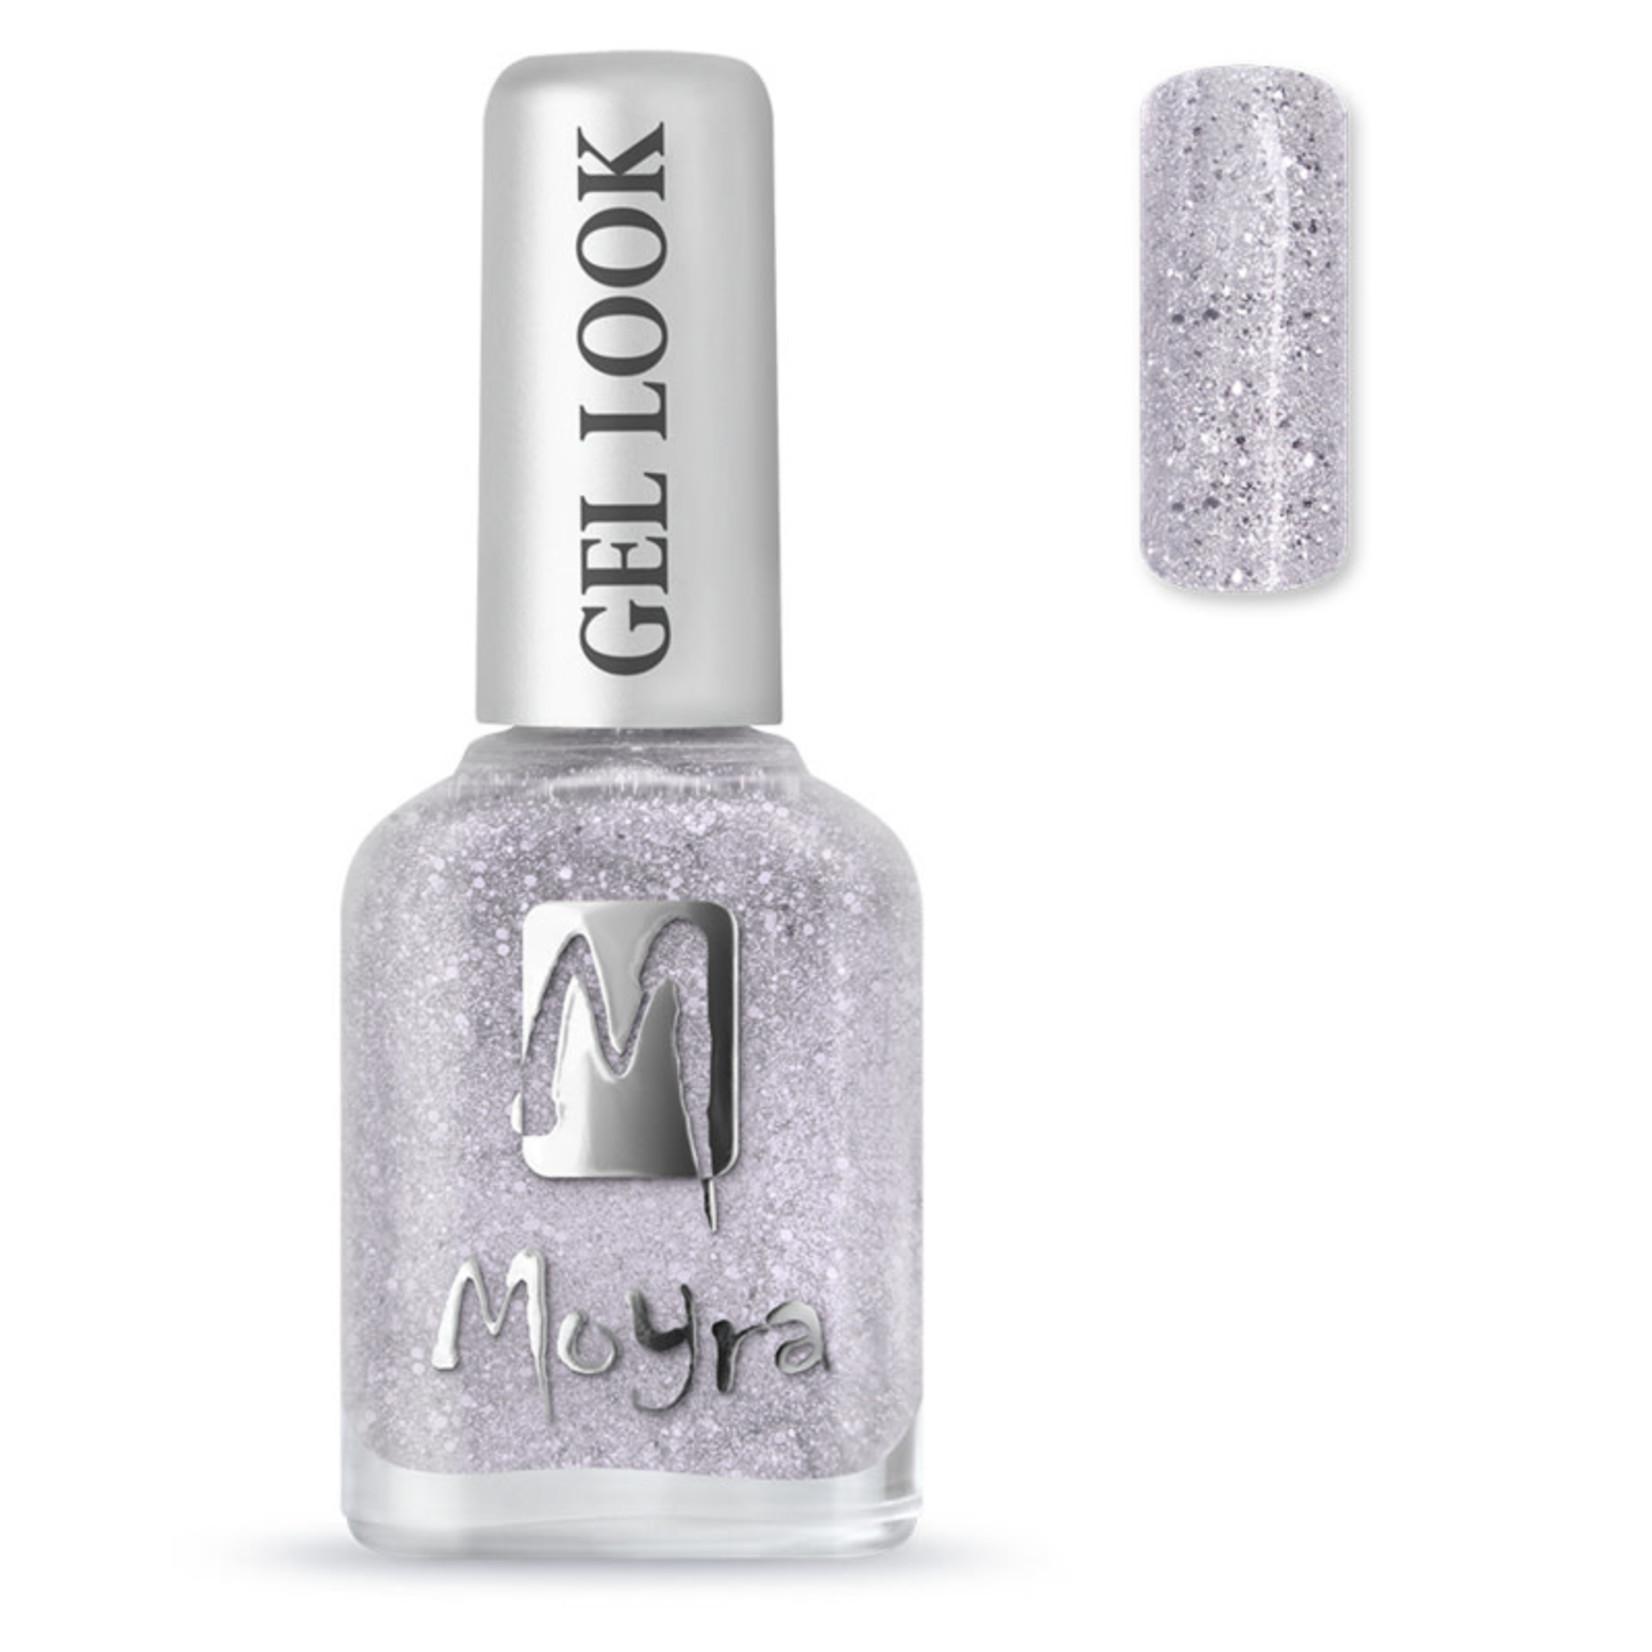 Moyra Moyra Gel Look nail polish 1011 Maissa